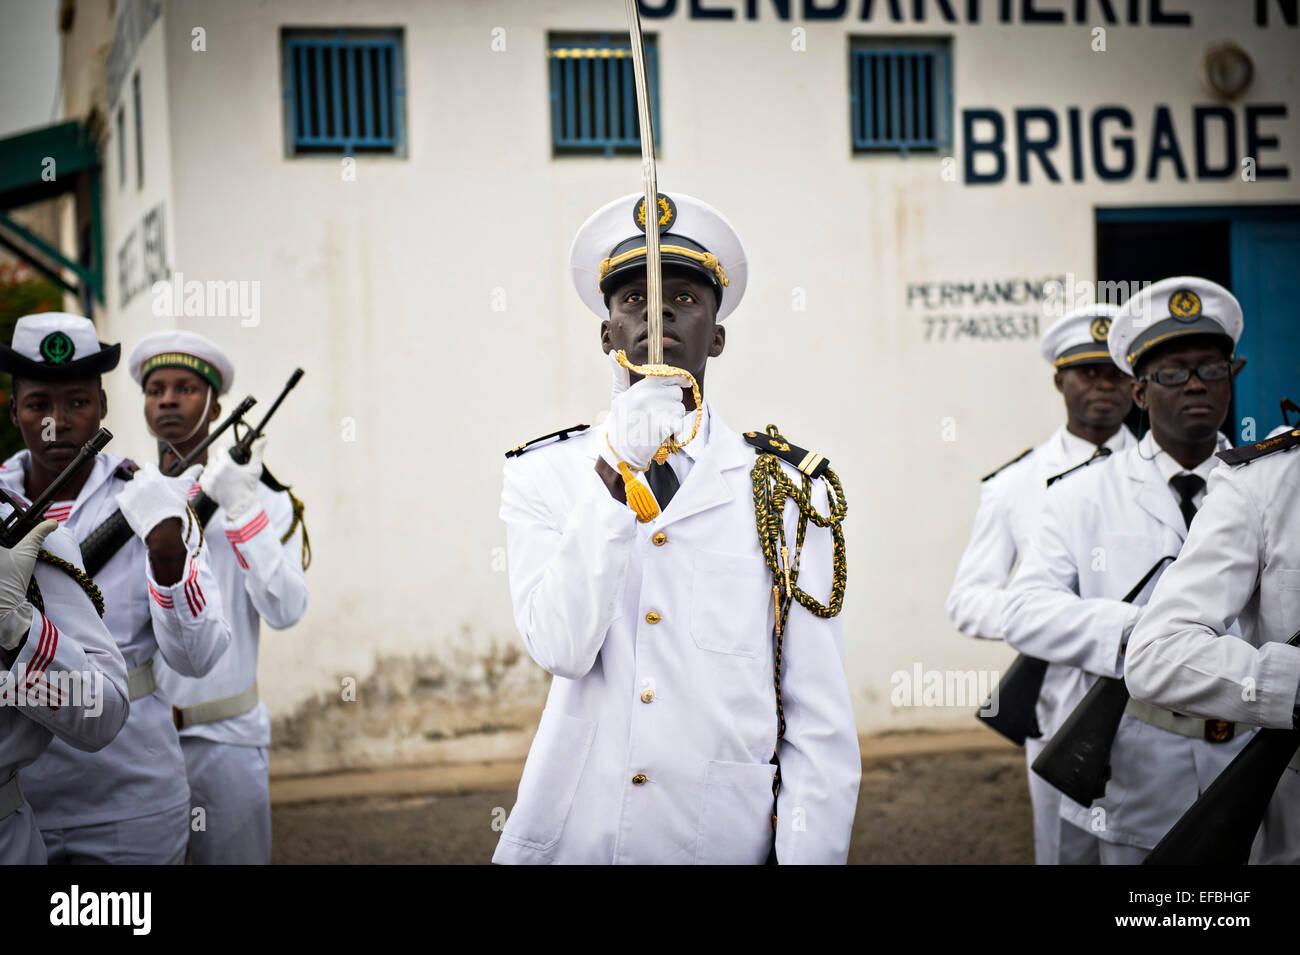 Senegalese sailors in parade dress during the Senegal Navy Celebration January 22, 2015 in Dakar, Senegal. - Stock Image